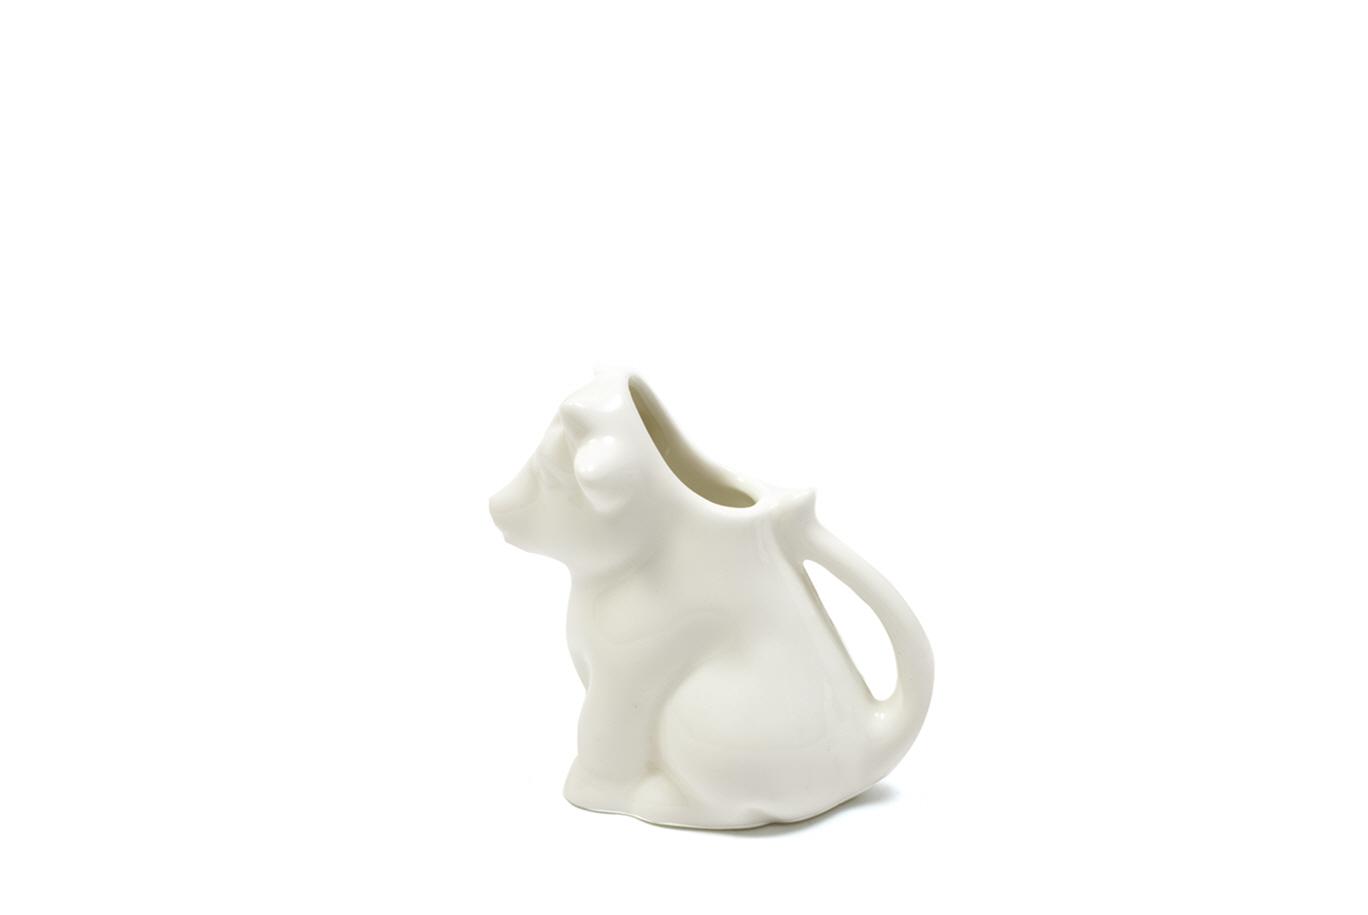 Mlékovka kráva White Basics 100 ml - Maxwell&Williams